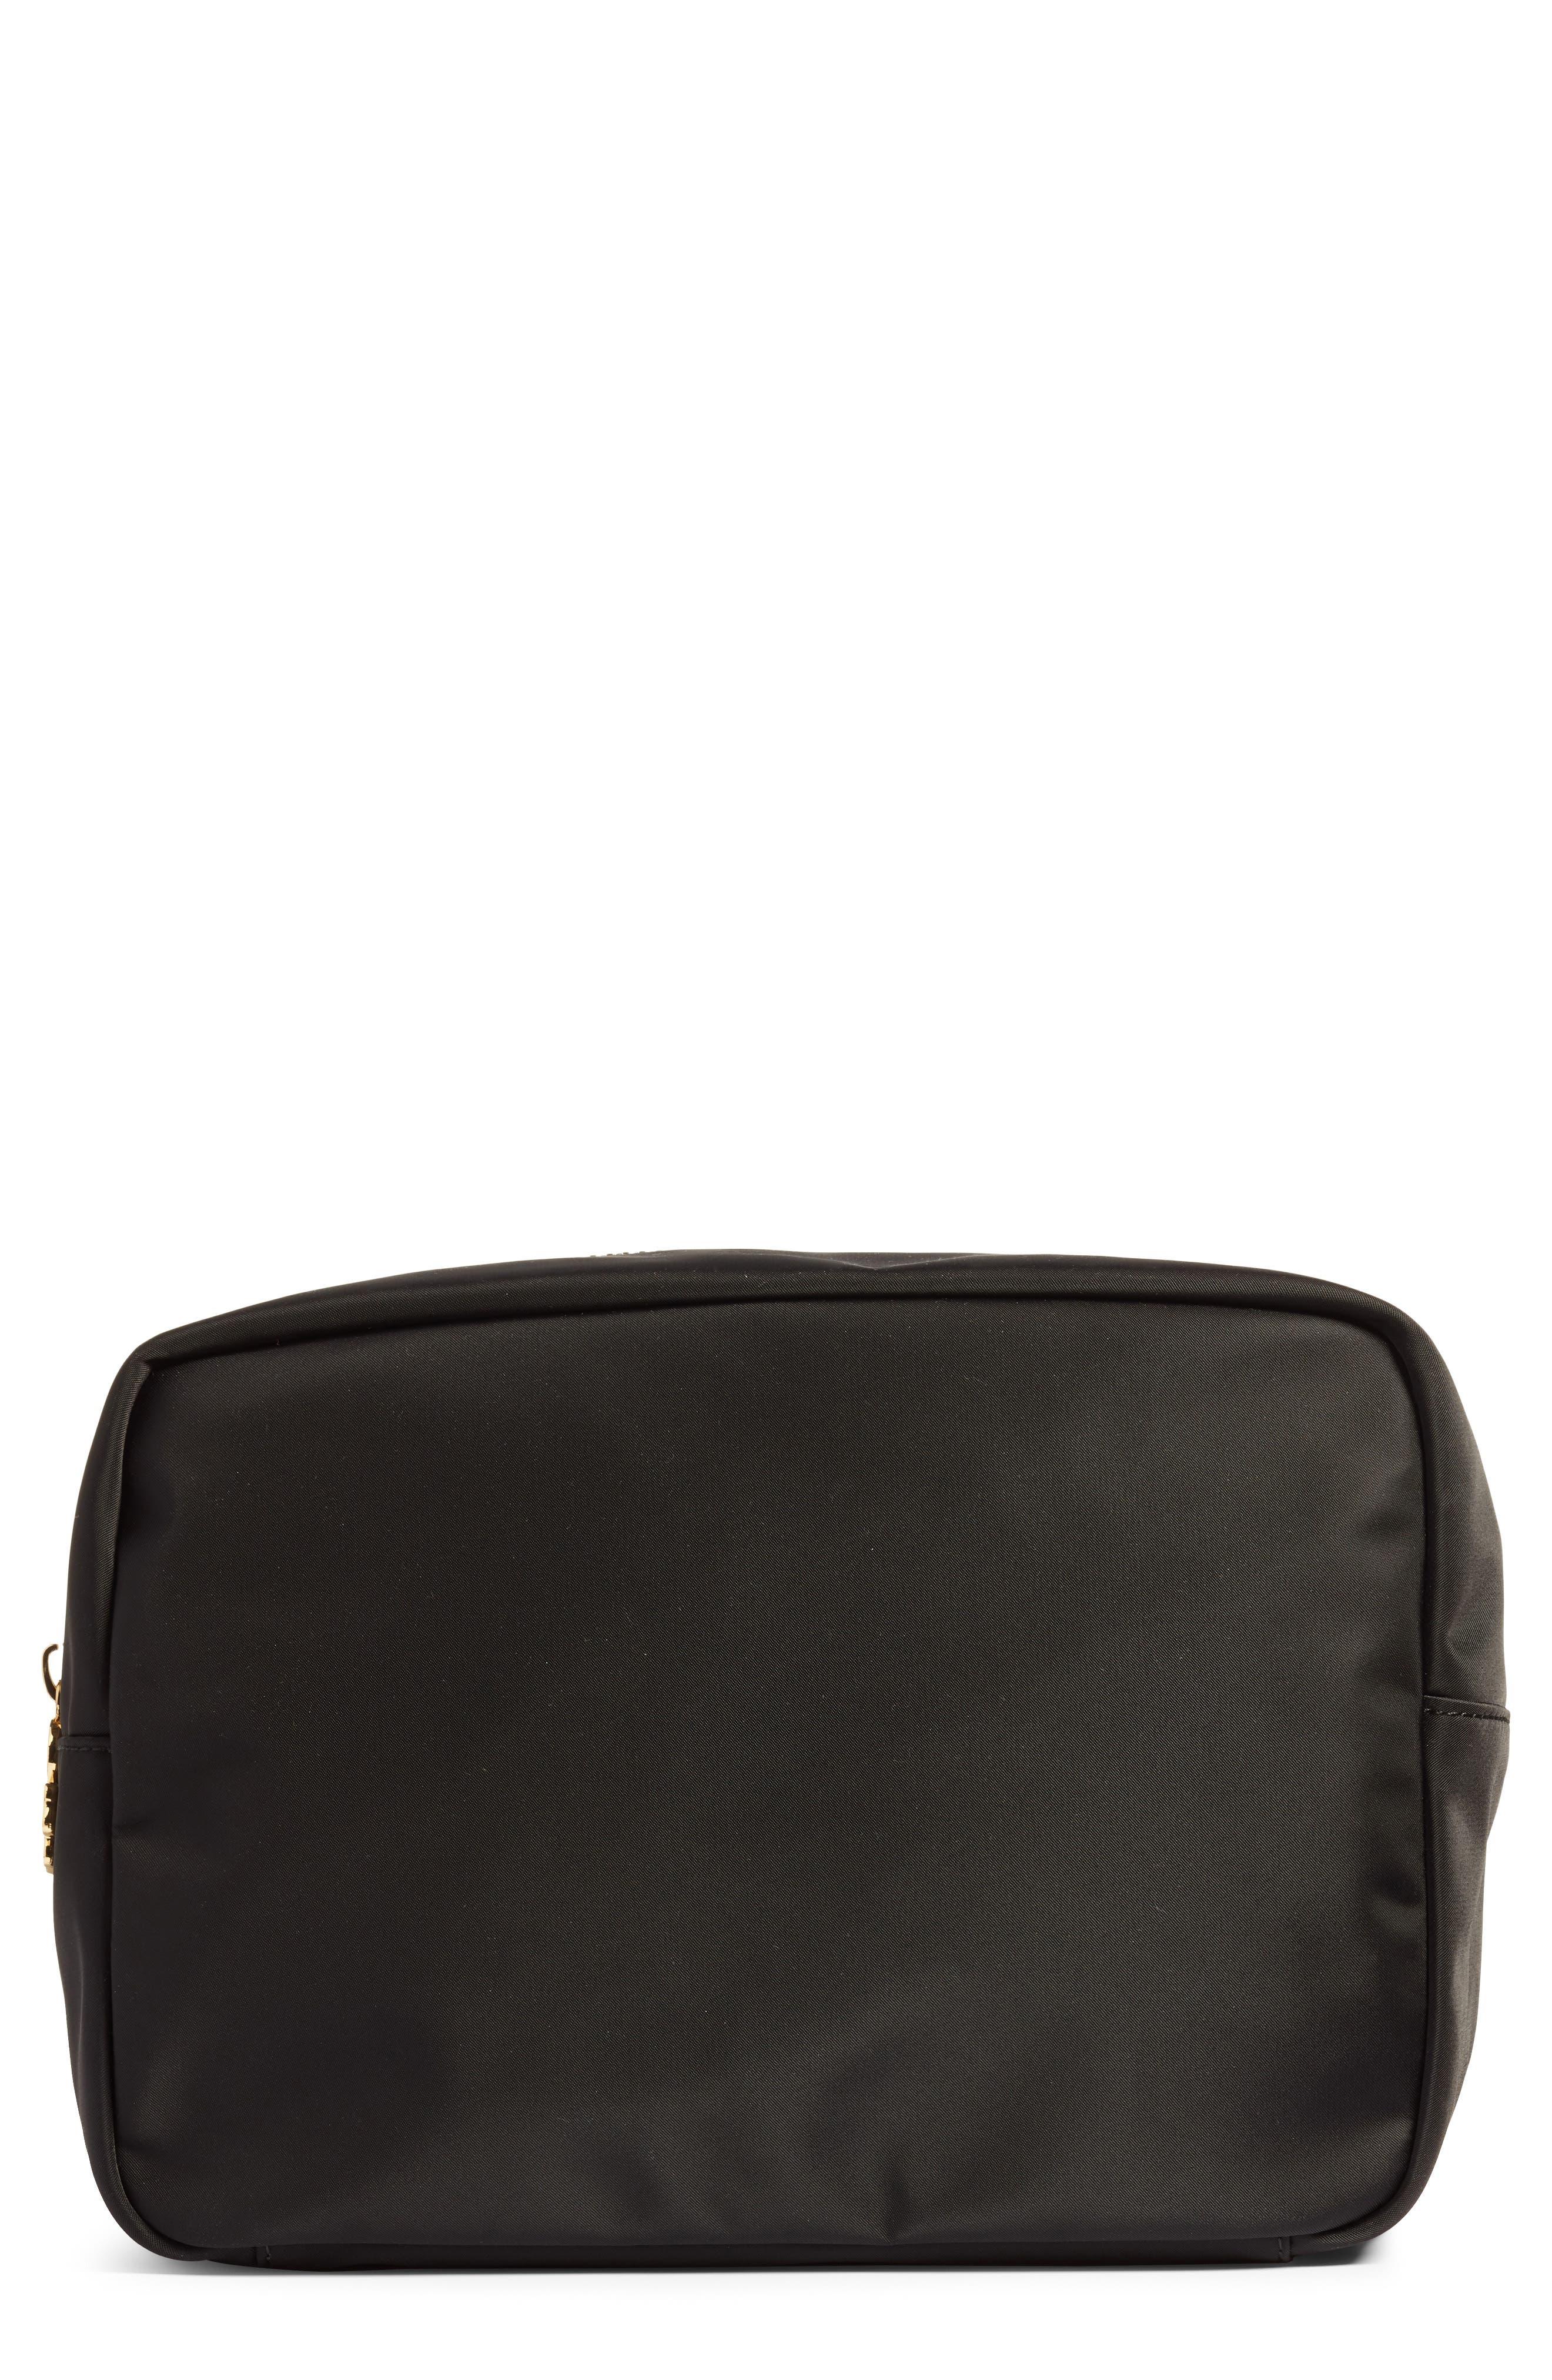 STONEY CLOVER LANE Nylon Large Cosmetics Pouch in Black